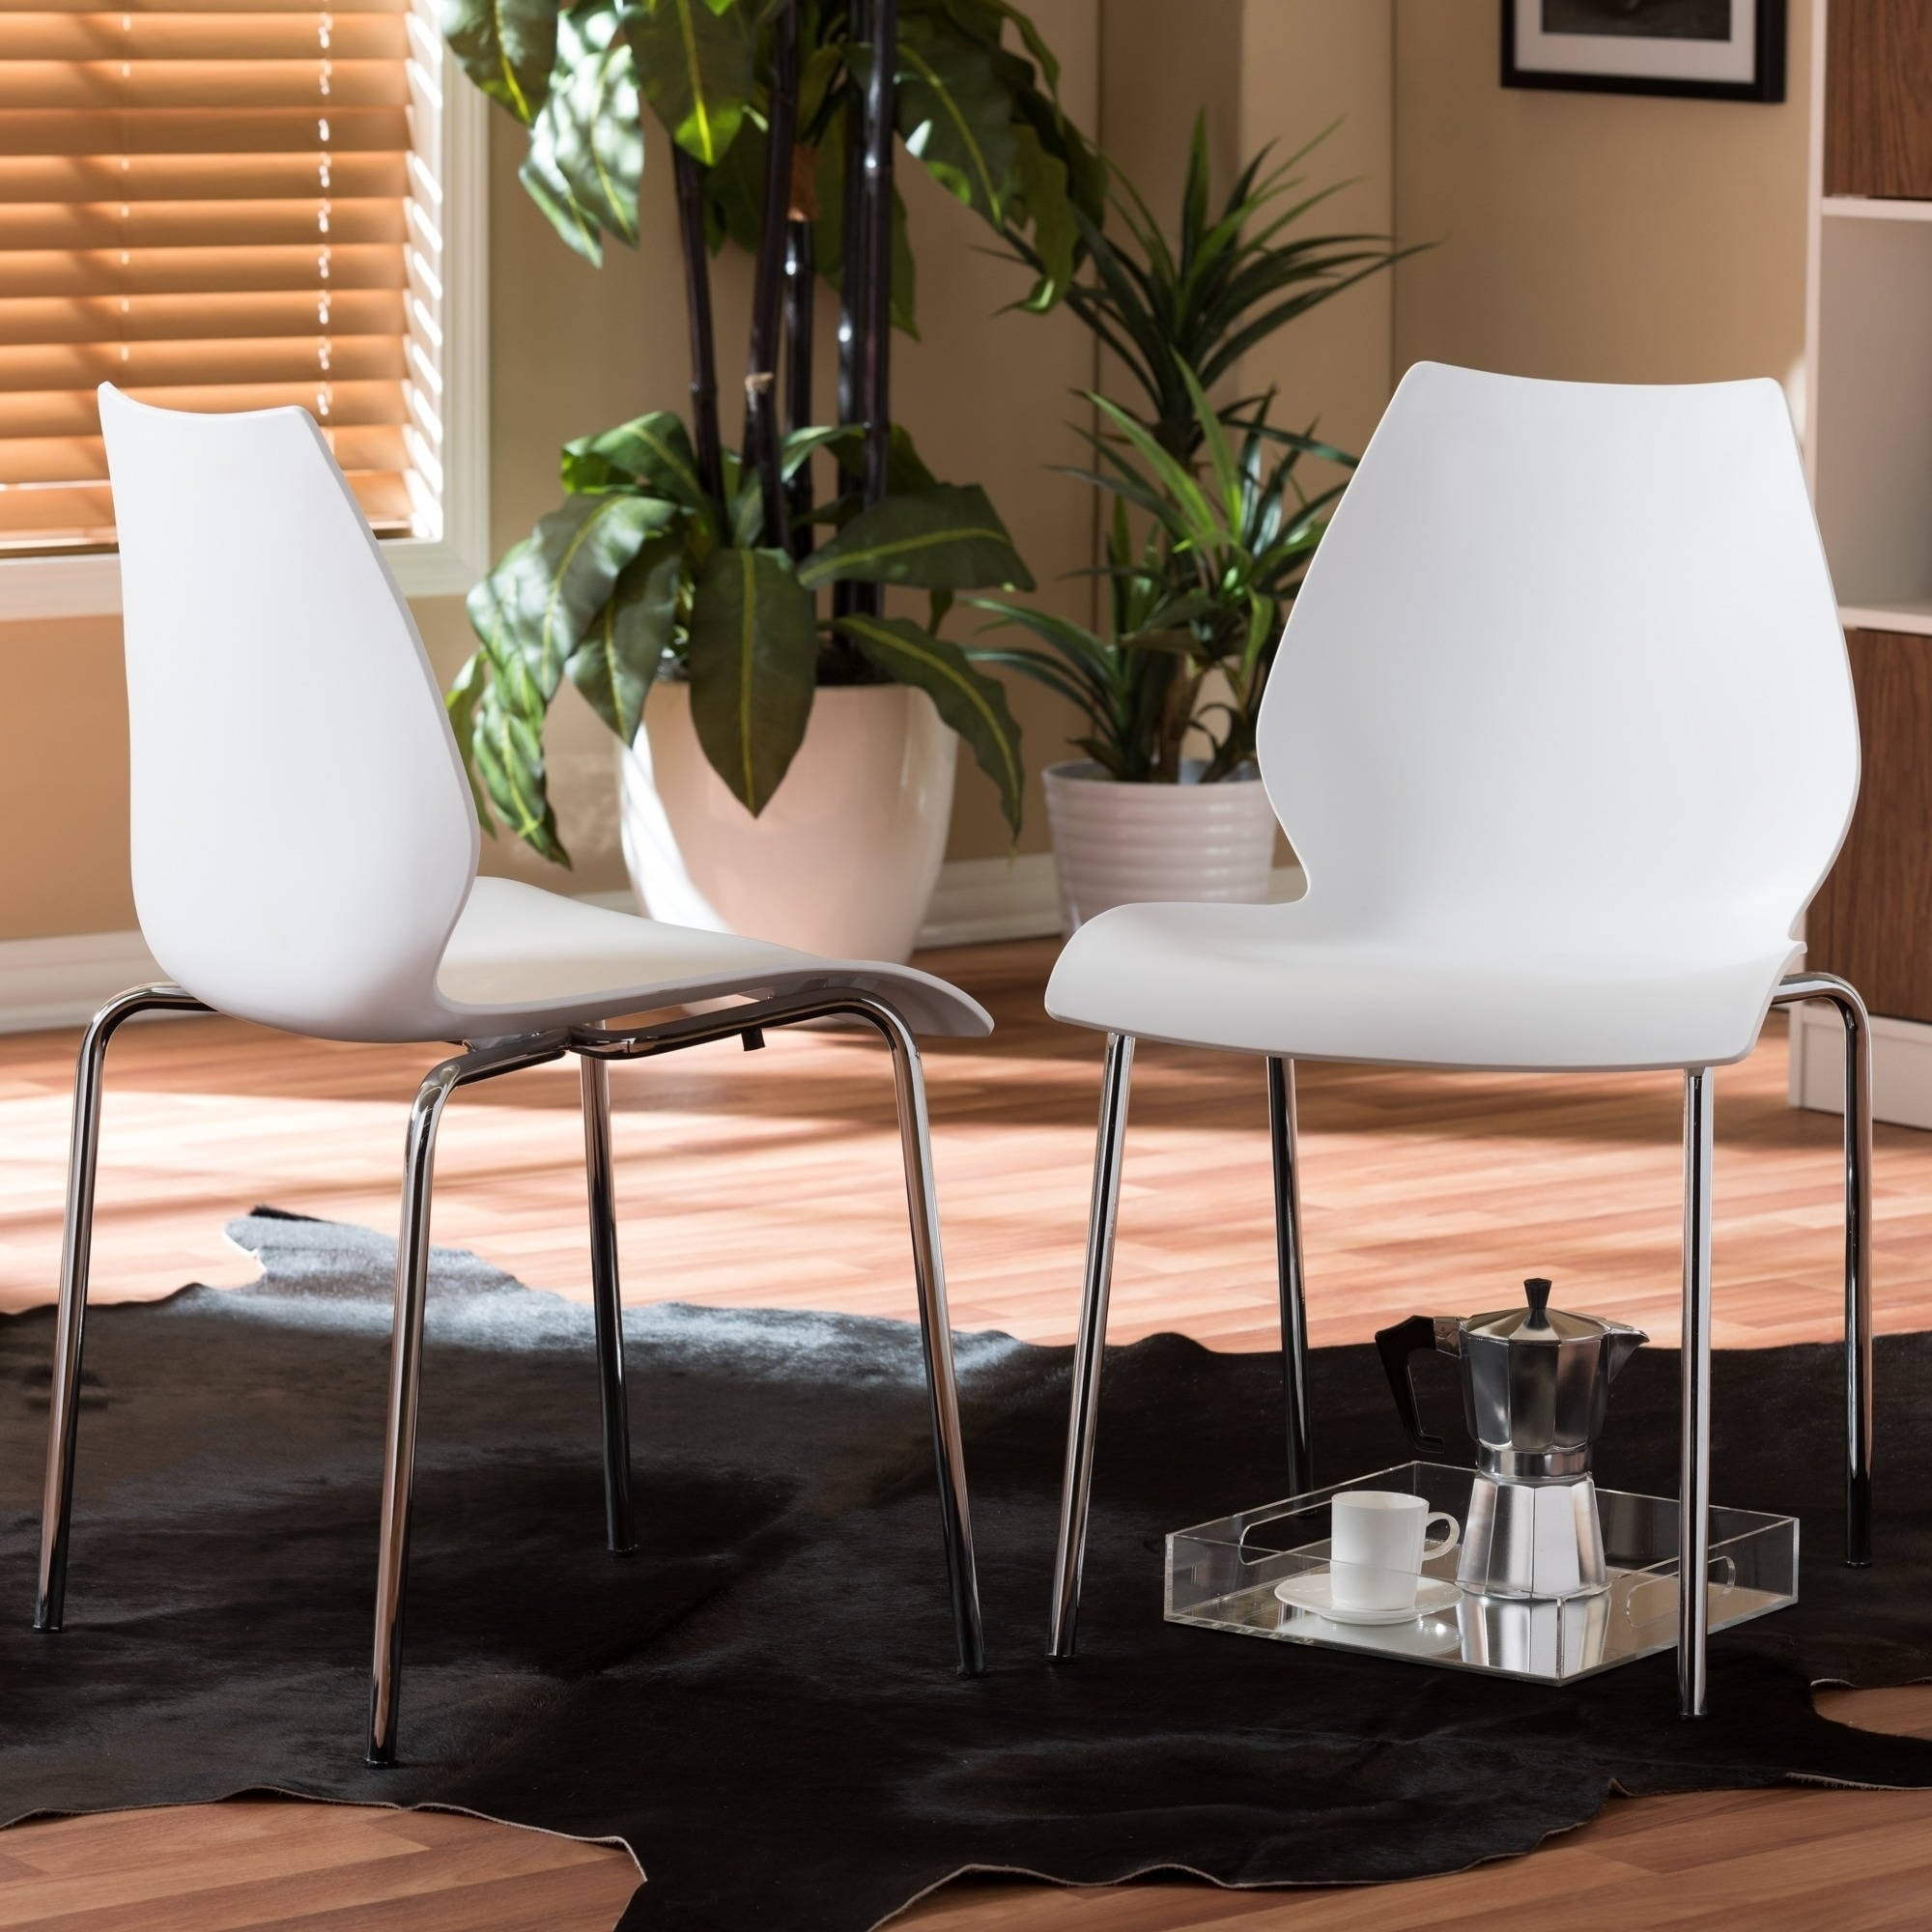 Porch & Den Victoria Park Gordon White Plastic Dining Chair 2-piece Set